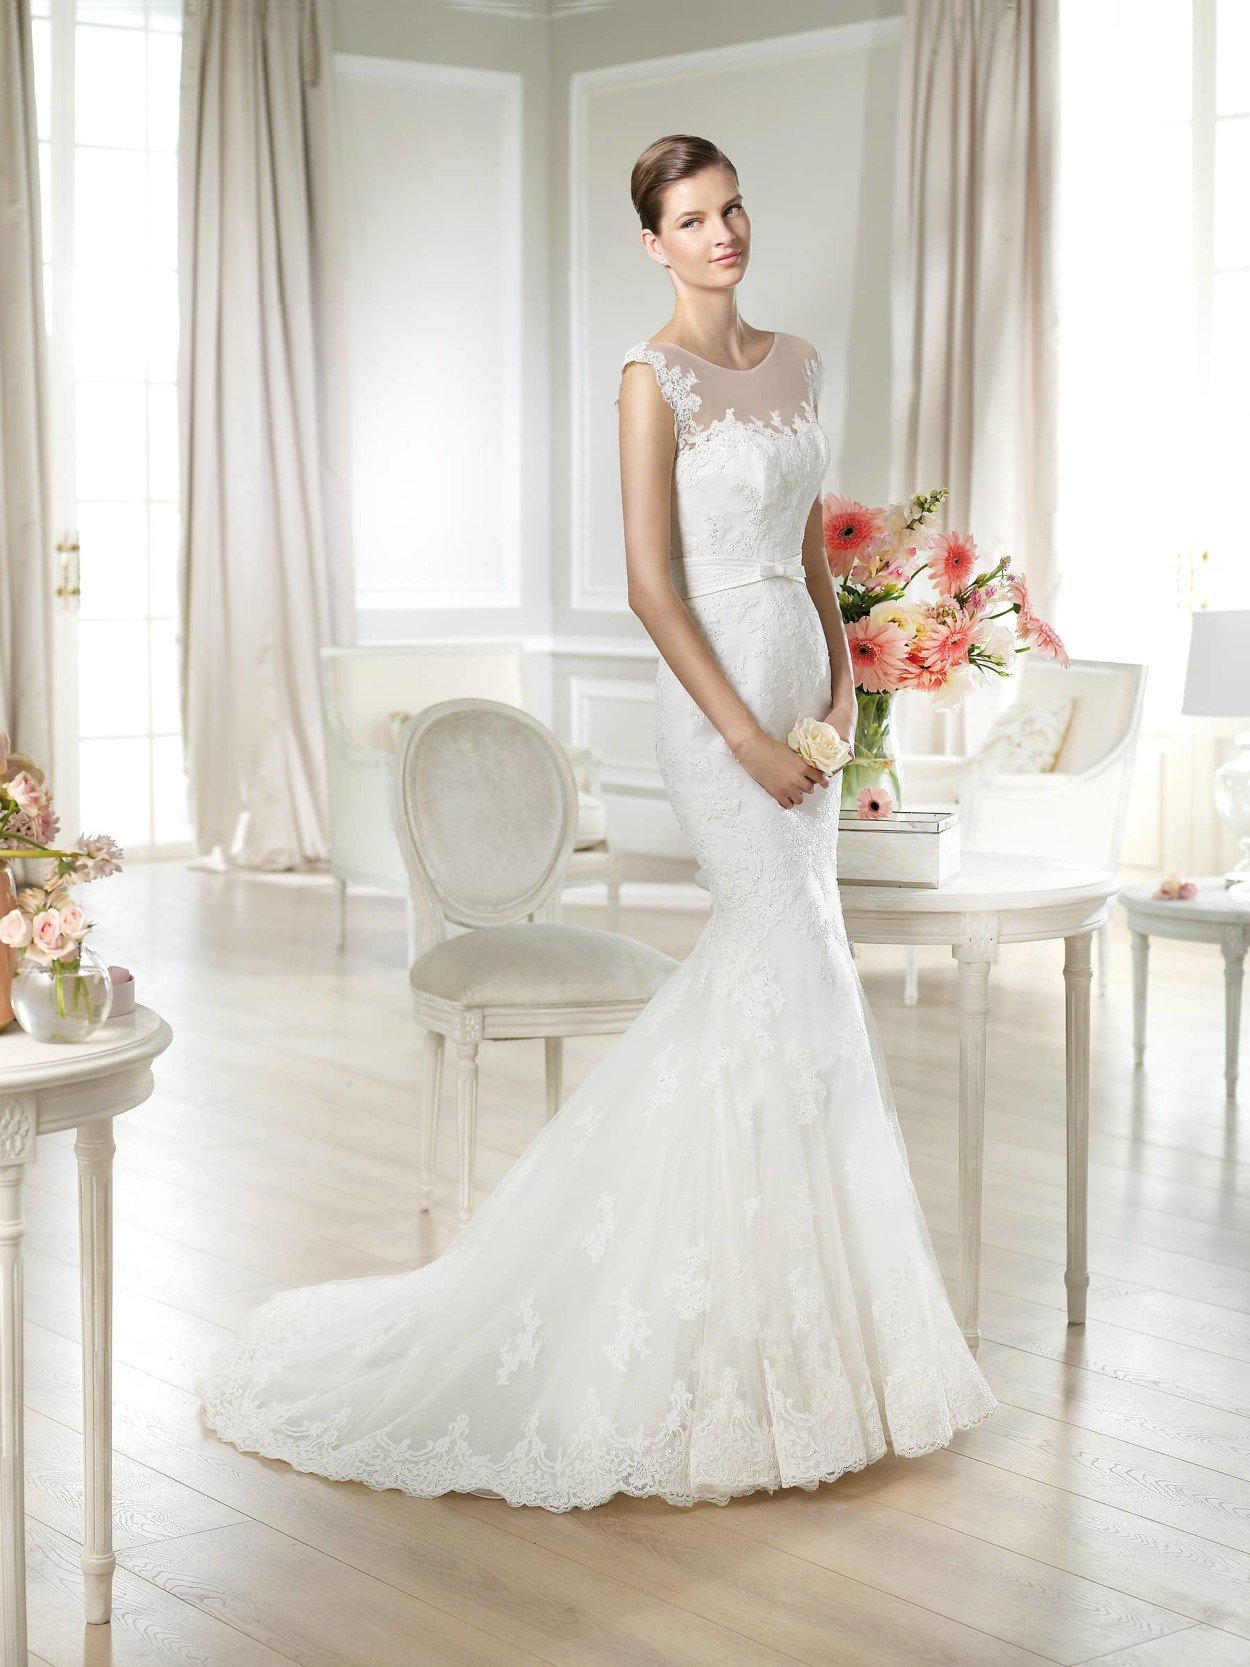 One white свадебные платья